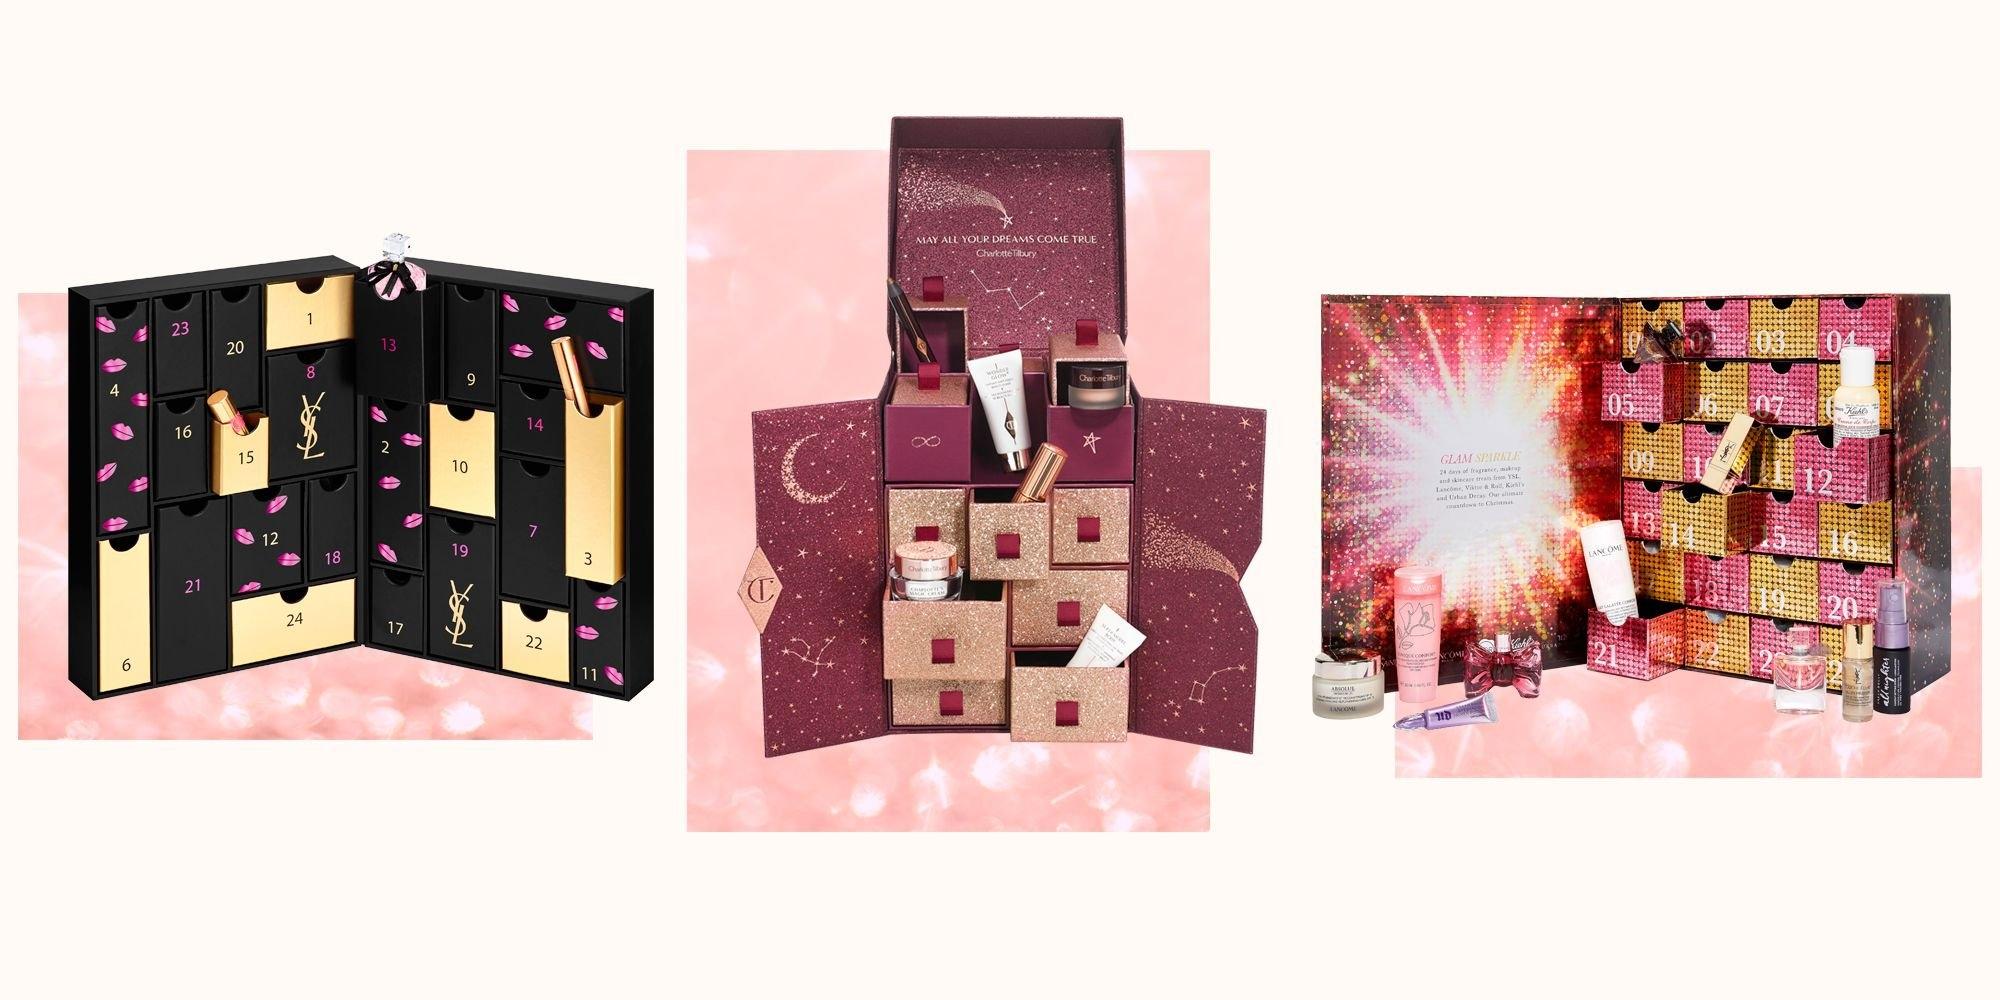 Beauty Advent Calendars 2019 - 40+ Of Best, From Charlotte Tilbury L'occitane Advent Calendar 2019